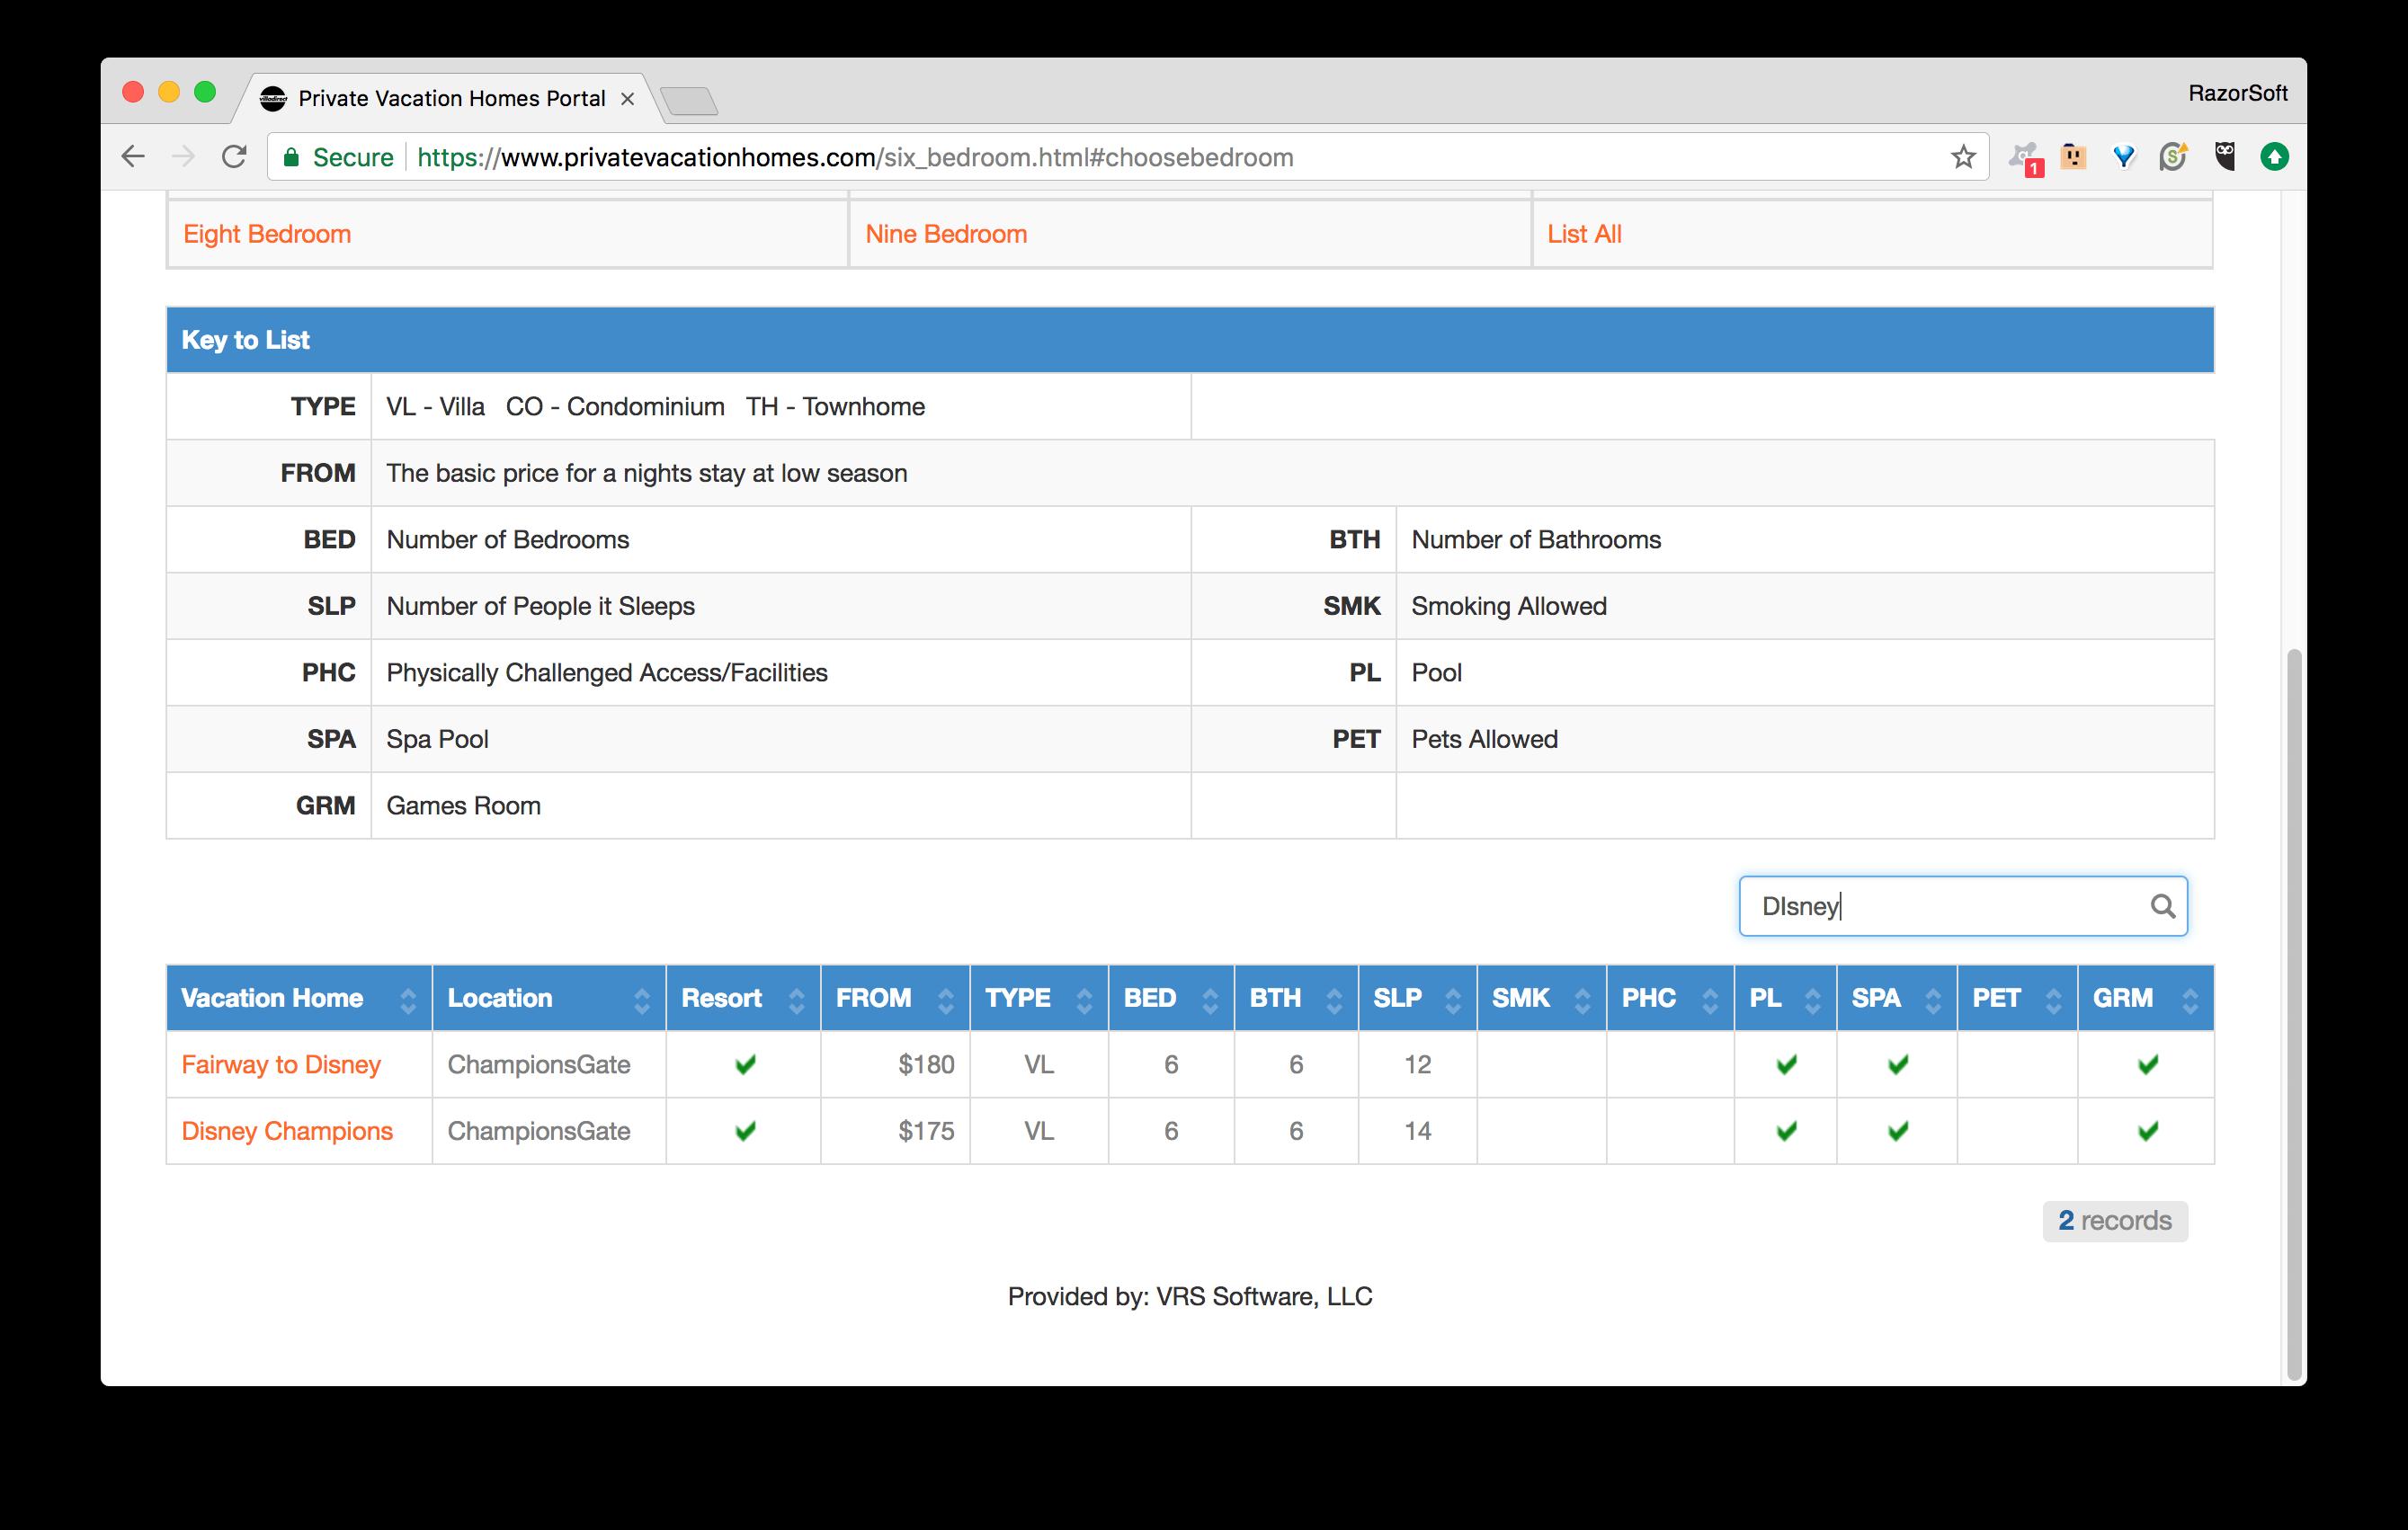 PrivateVacationHomes.com Portal Selection